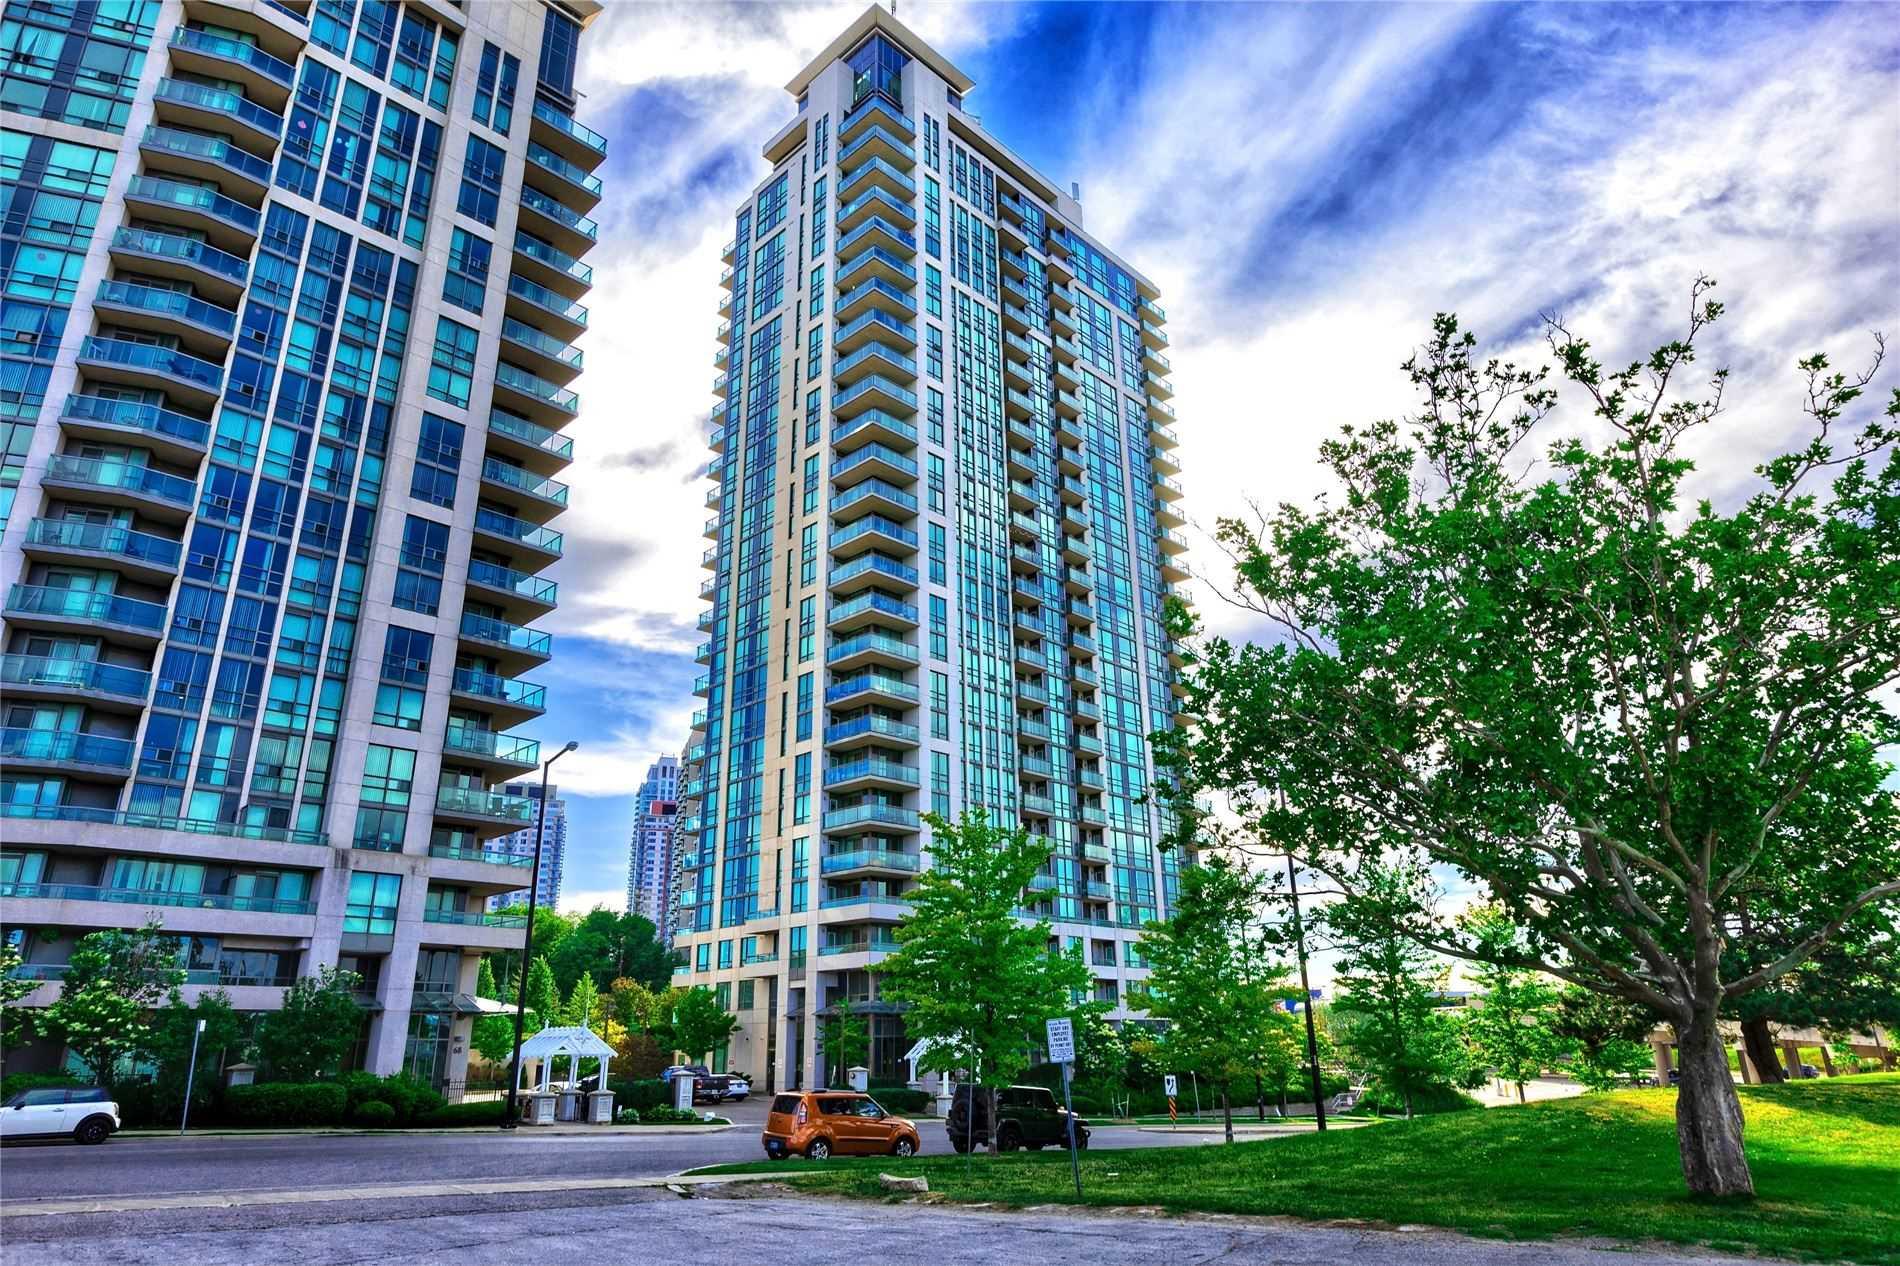 Condo Apt For Sale In Toronto , 2 Bedrooms Bedrooms, ,2 BathroomsBathrooms,Condo Apt,For Sale,2709,Grangeway